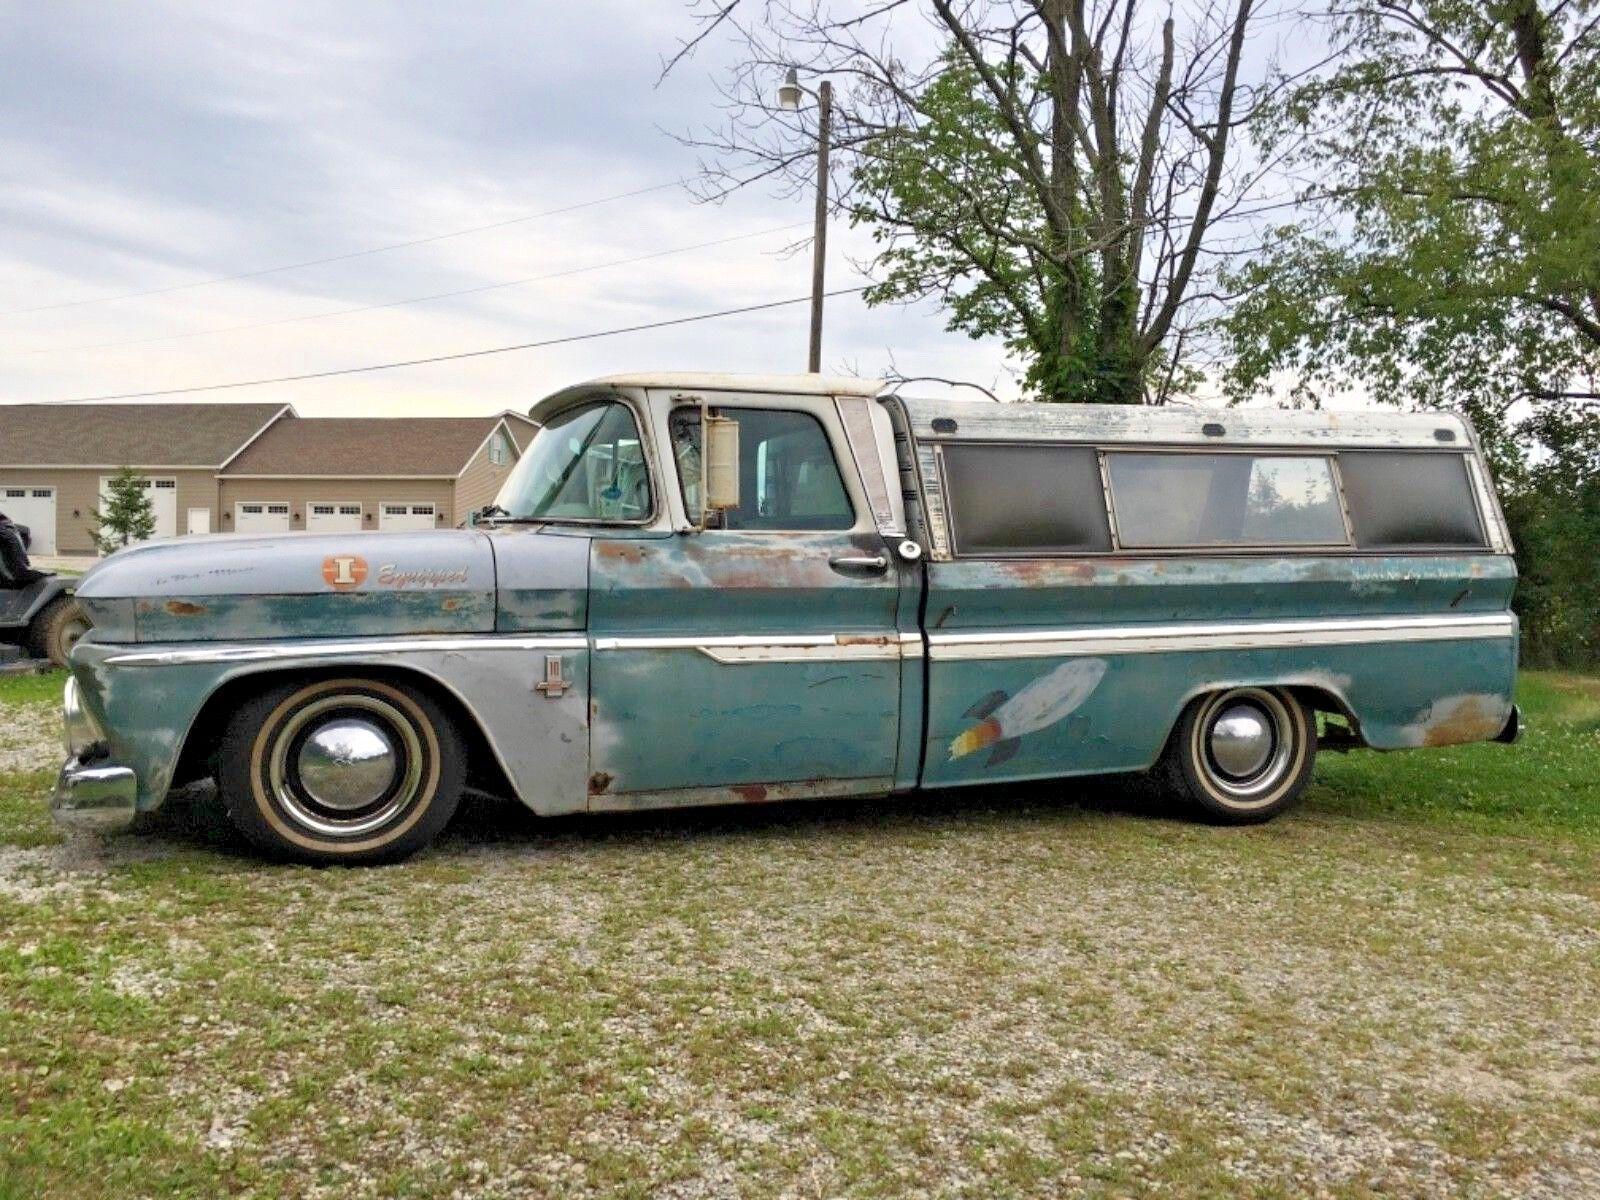 1963 Chevrolet C-10  1963 chevy fleetside c10 pickup 8ft bed patina